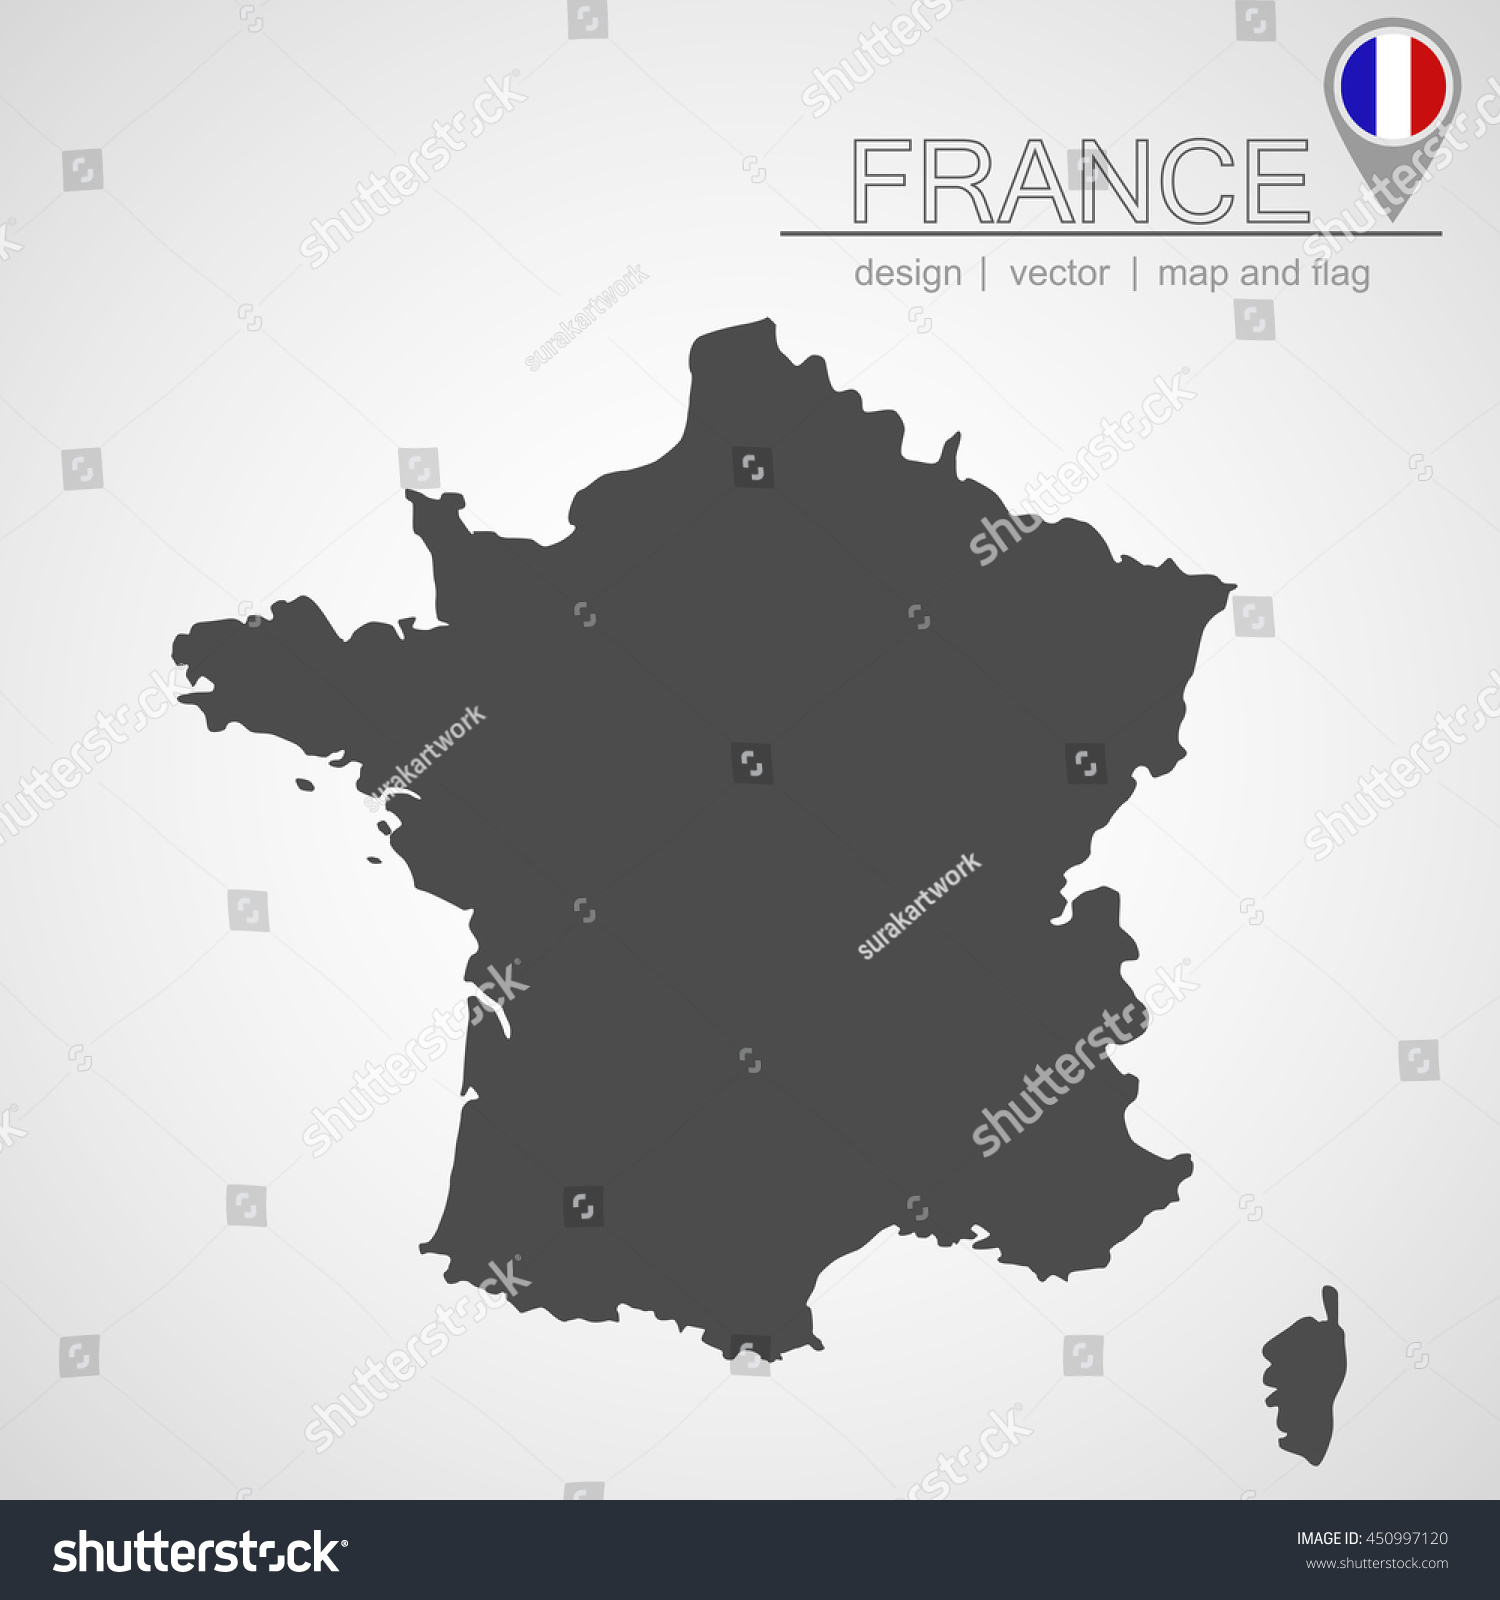 France Map Location France Flag Application Stock Vector (Royalty ...